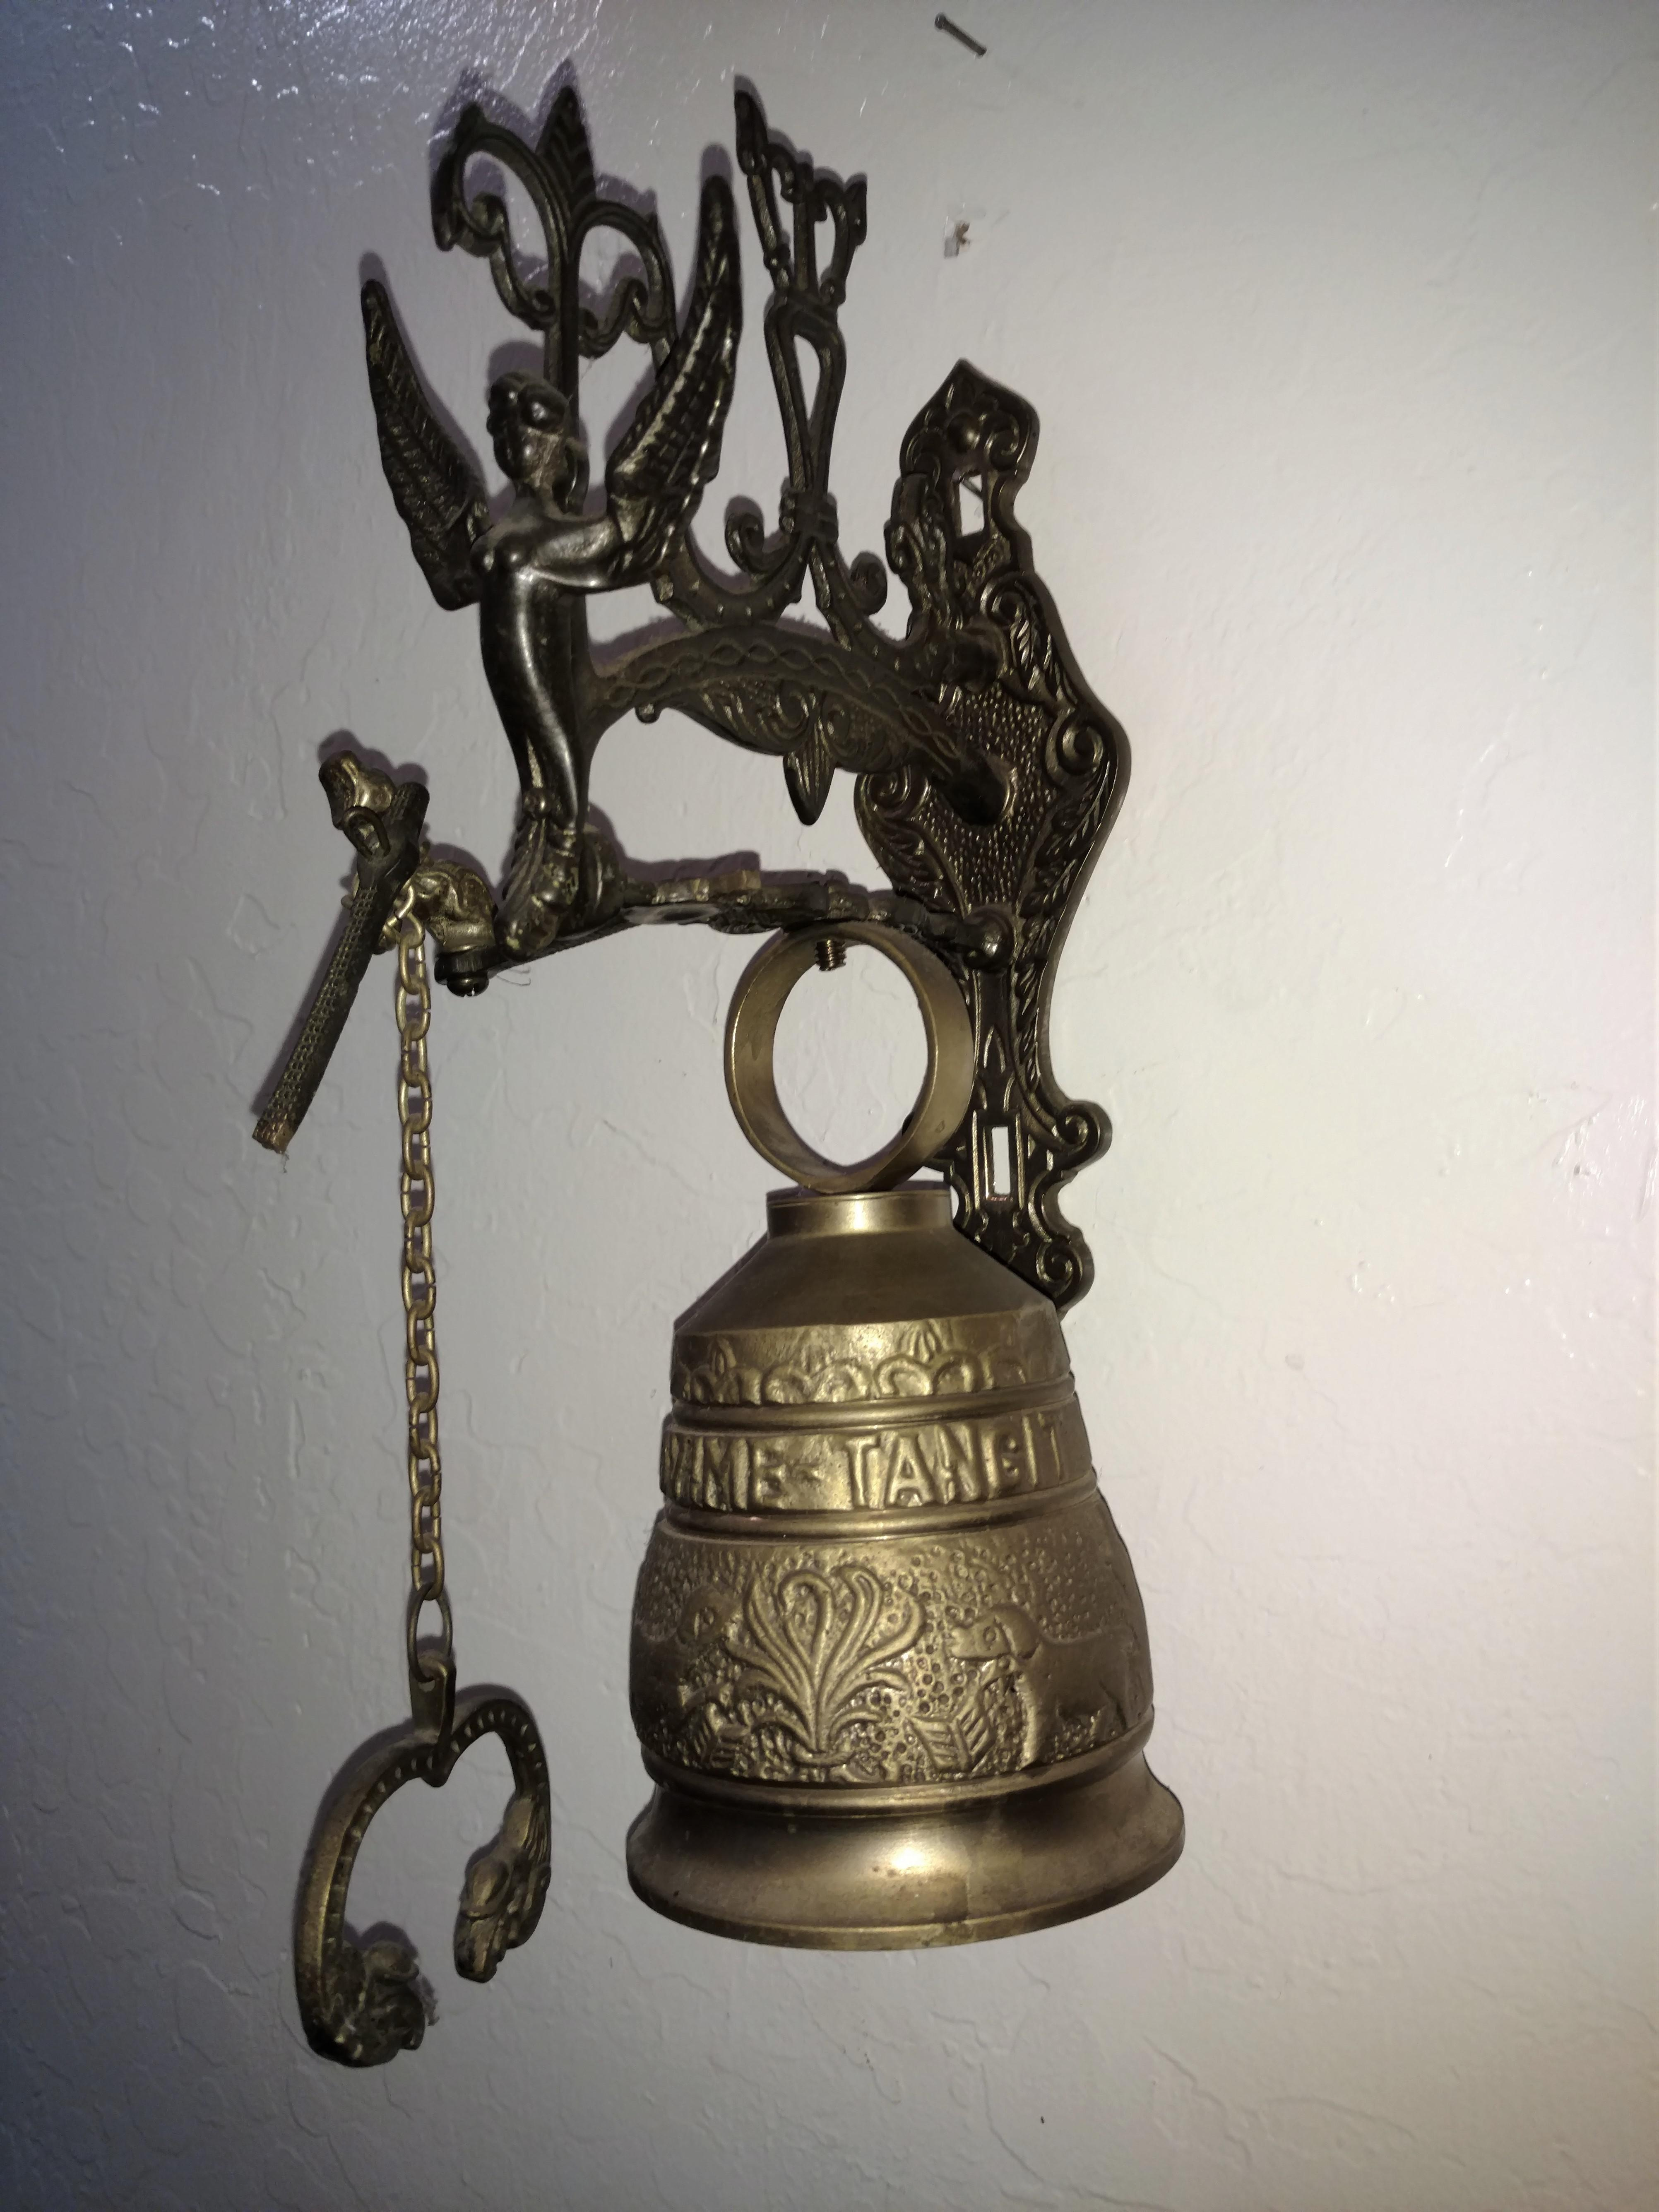 Charmant Ornate Door Bells Period Victorian Bell Home Design